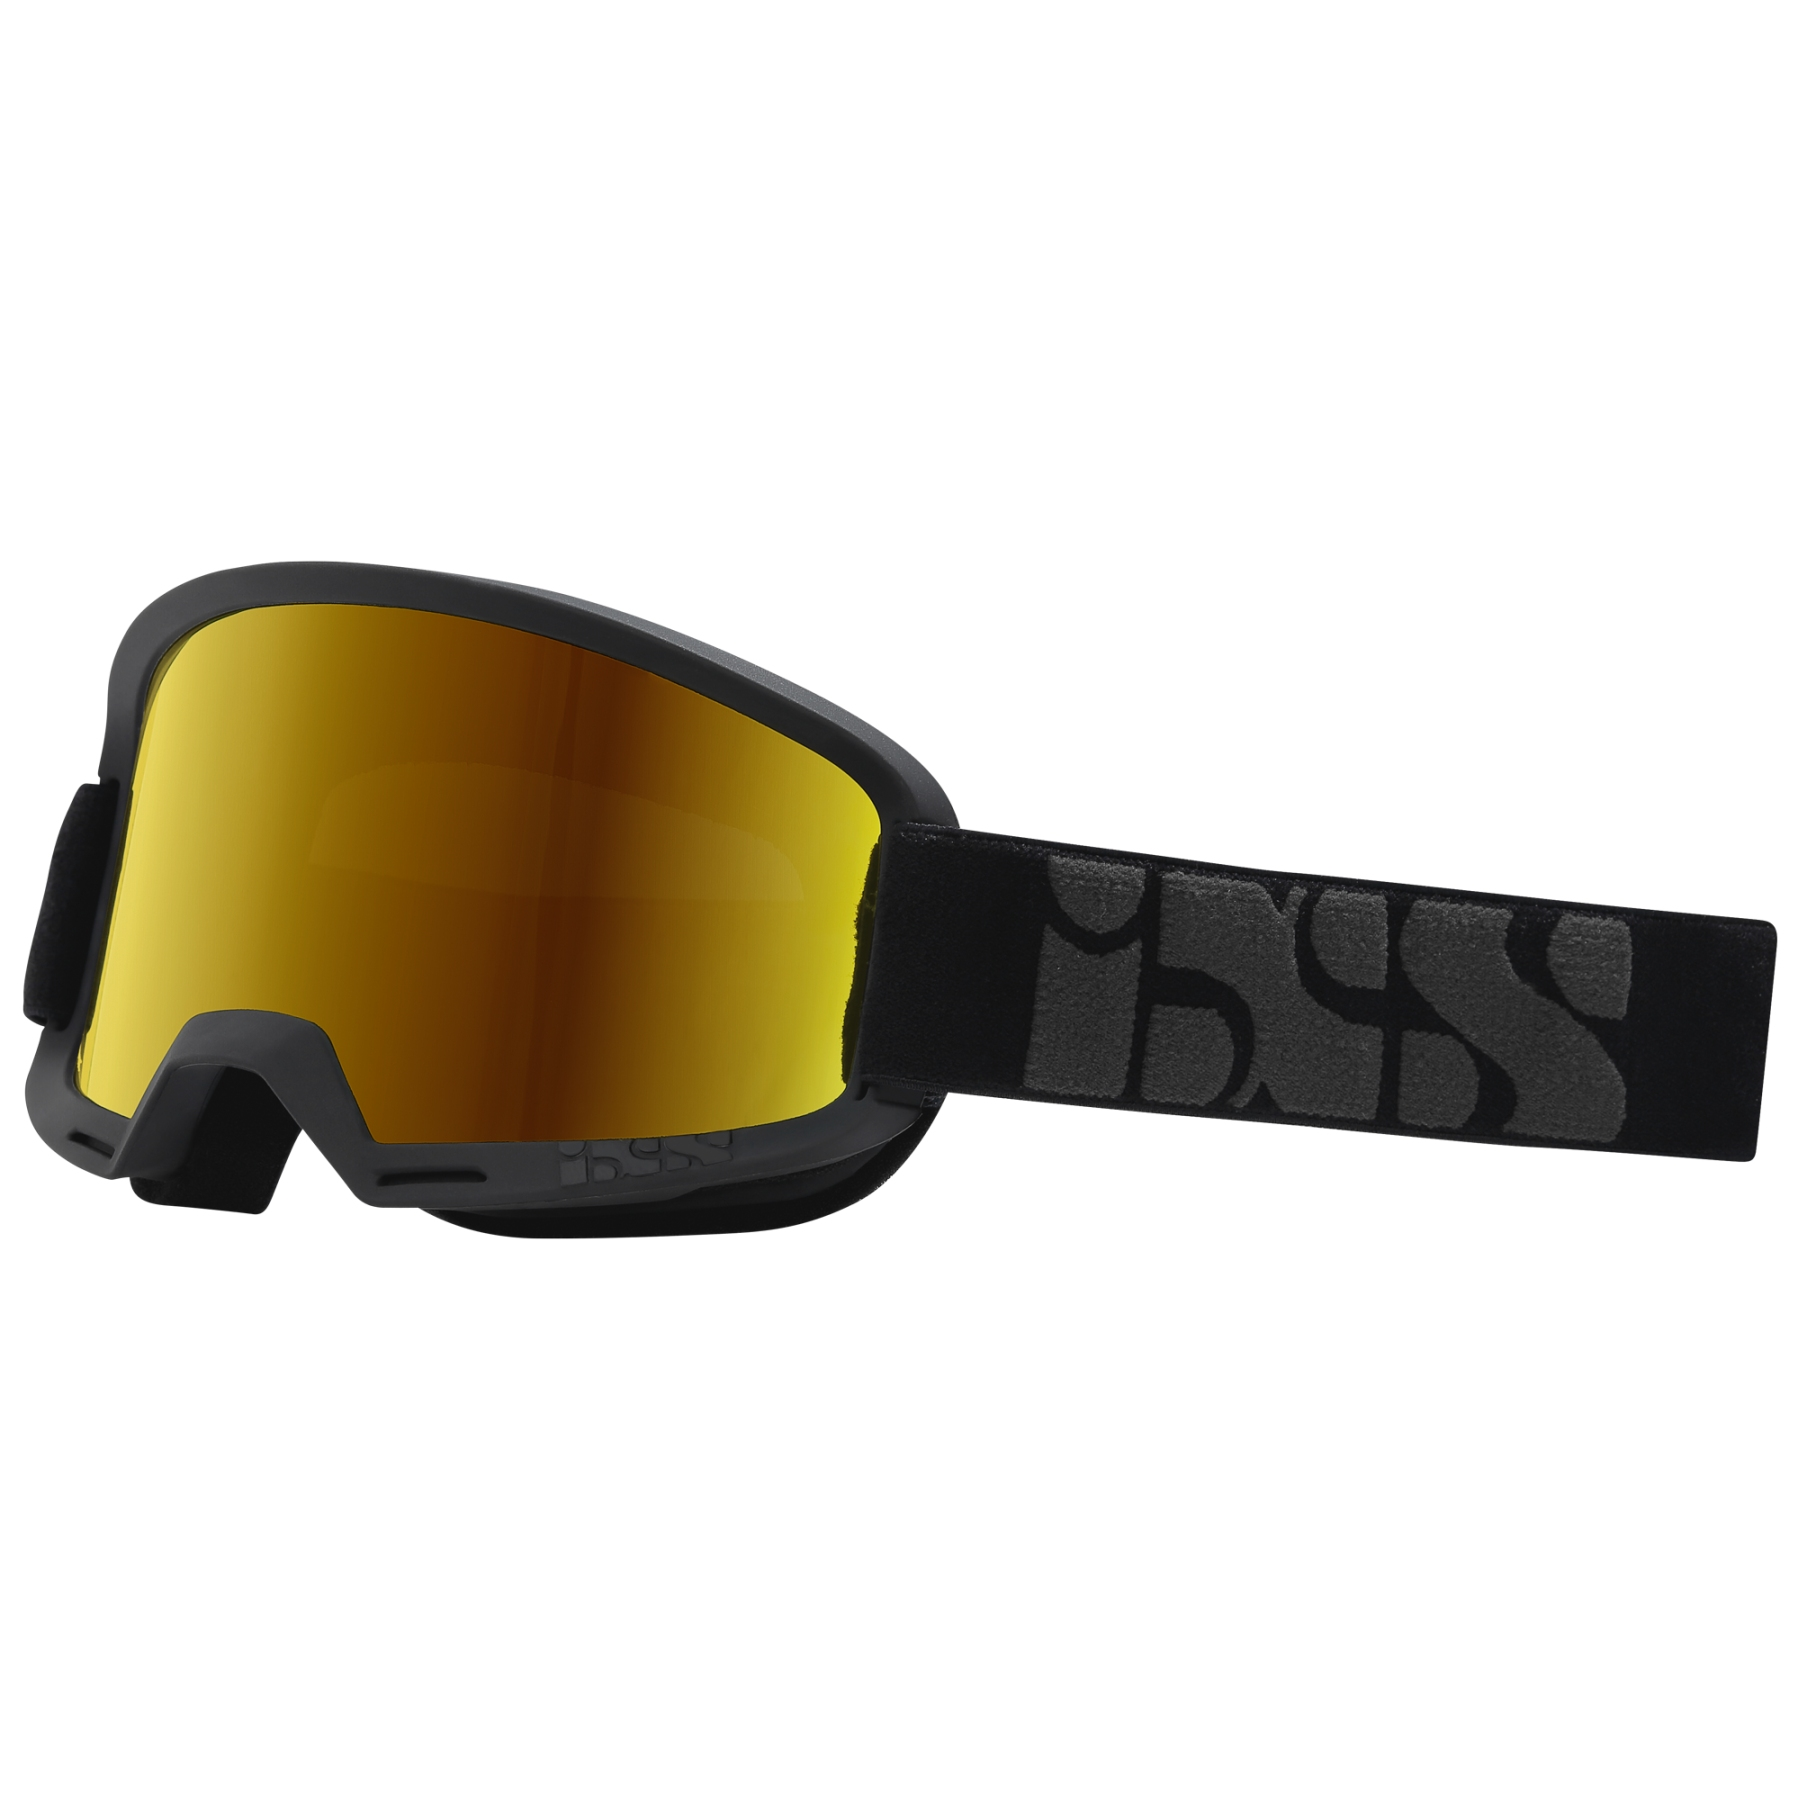 iXS Hack Race Mirror Goggle Bikebrille - black